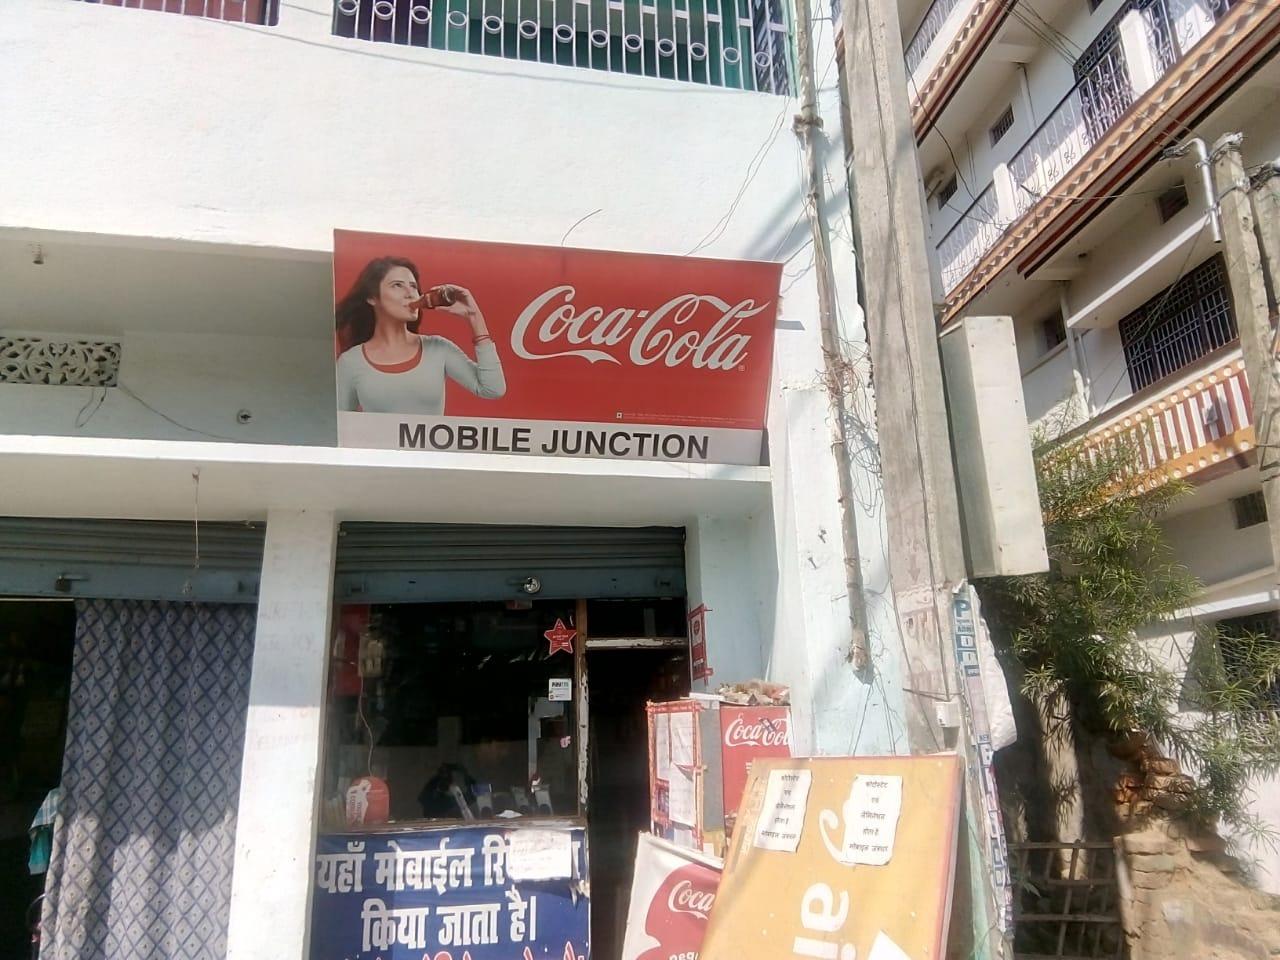 Mobile-Junction